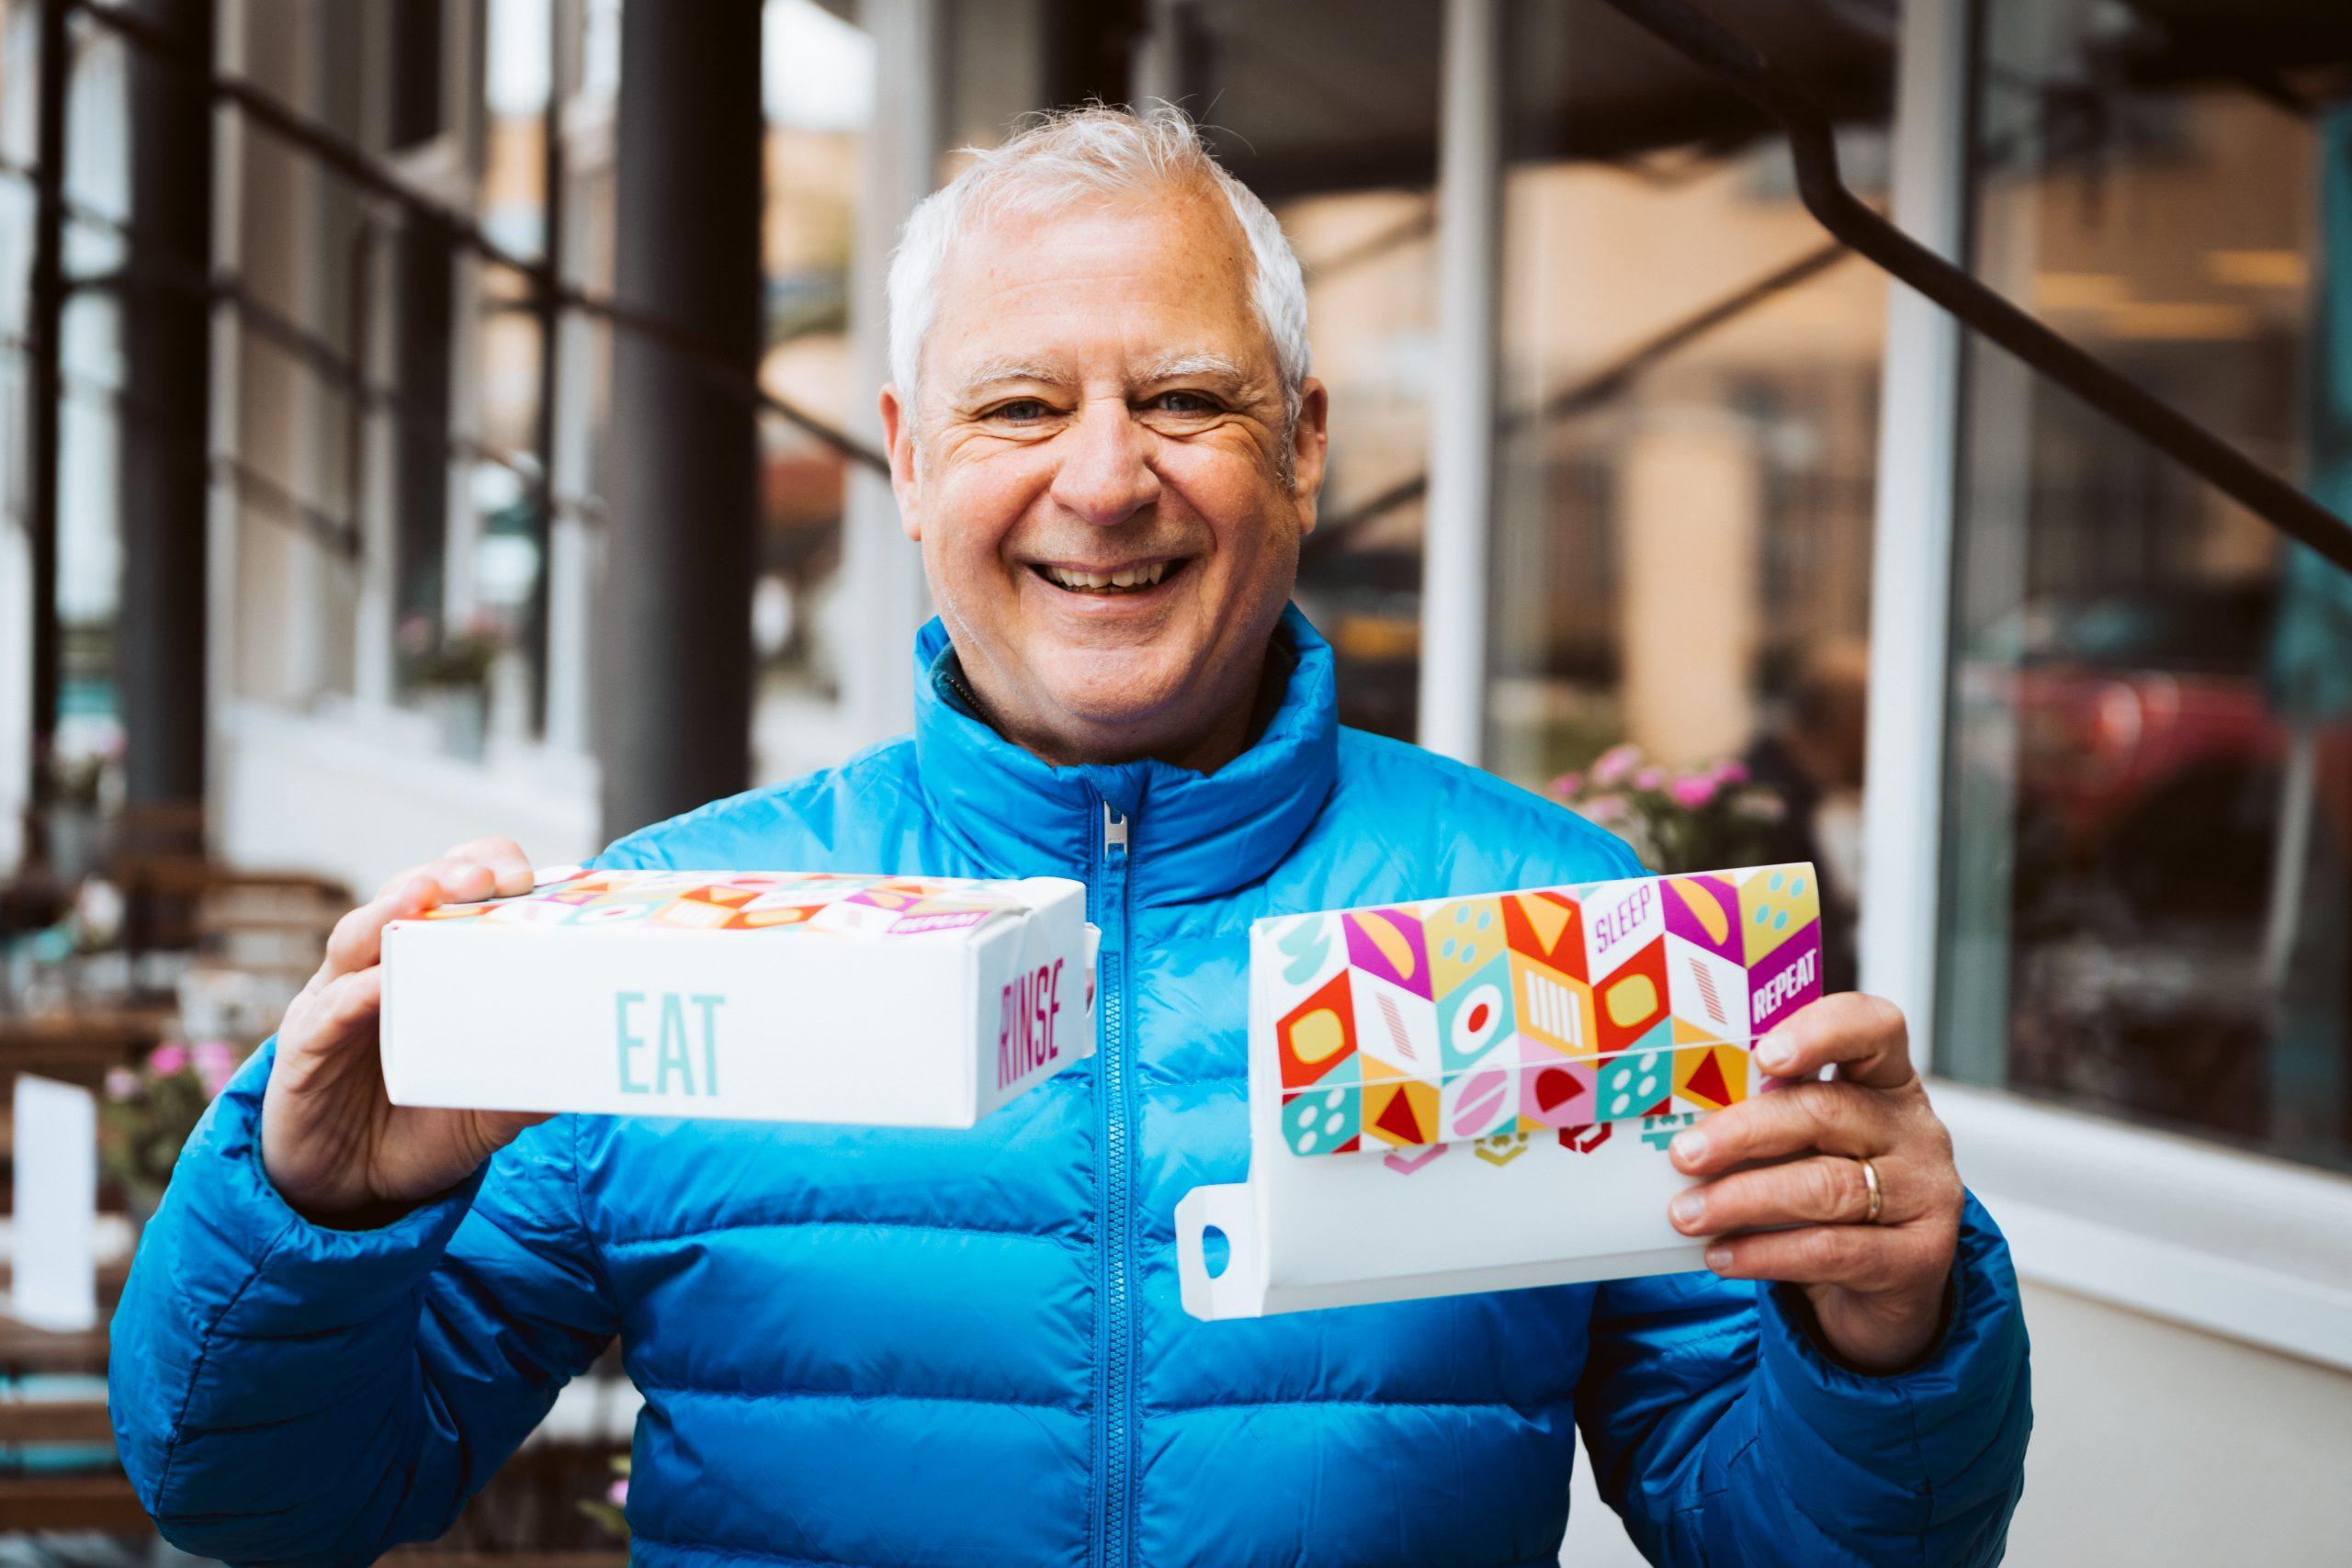 Eddie Stableford, creator of Street Food Box